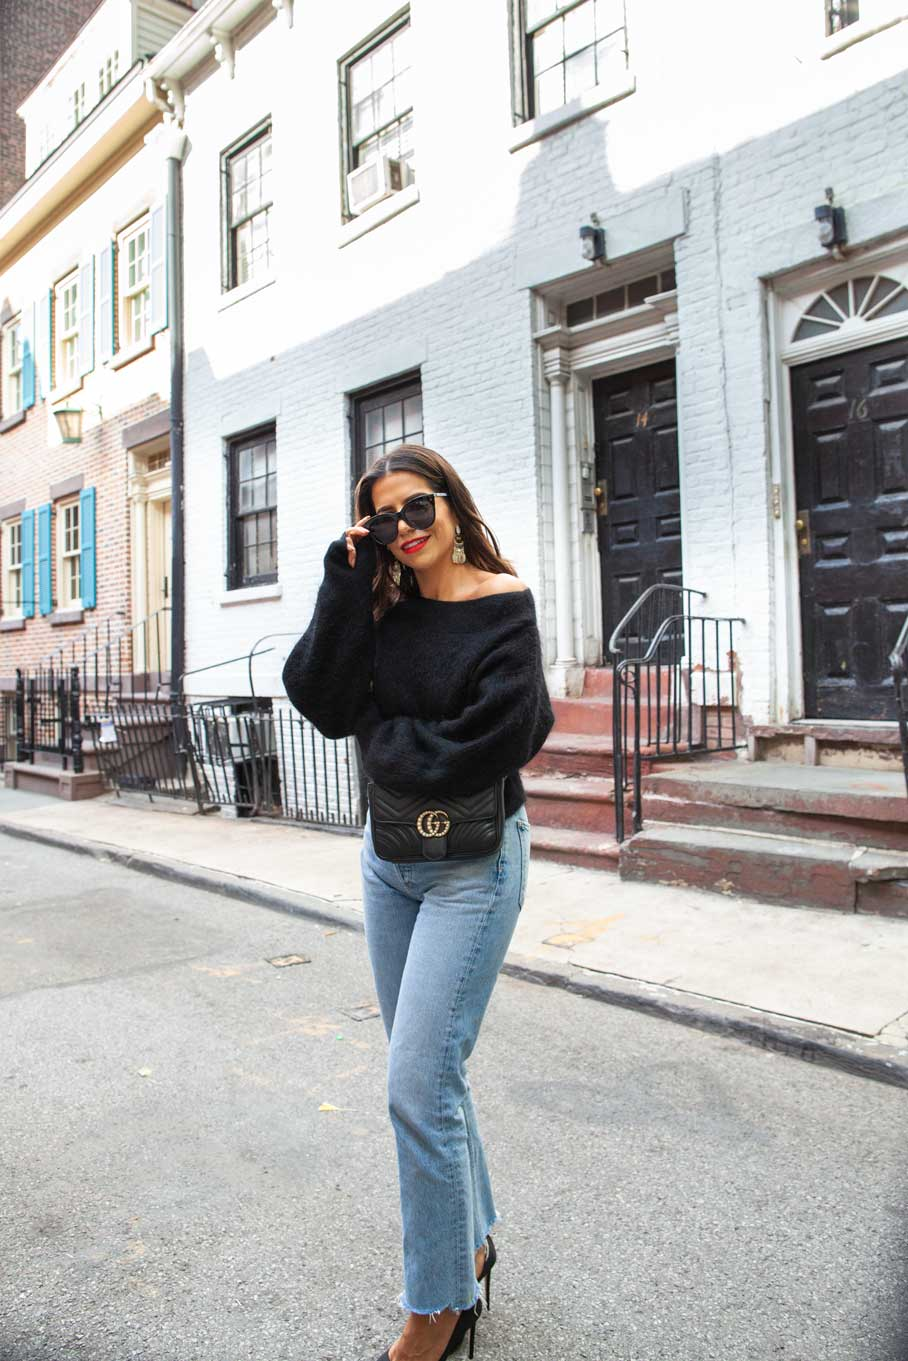 084905414f7c Black Sweater Sunglasses Gay Street Gucci Belt Bag Denim Jimmy Choo Designer  Le Specs Off SHoulder Red Lips NYC Fall 5